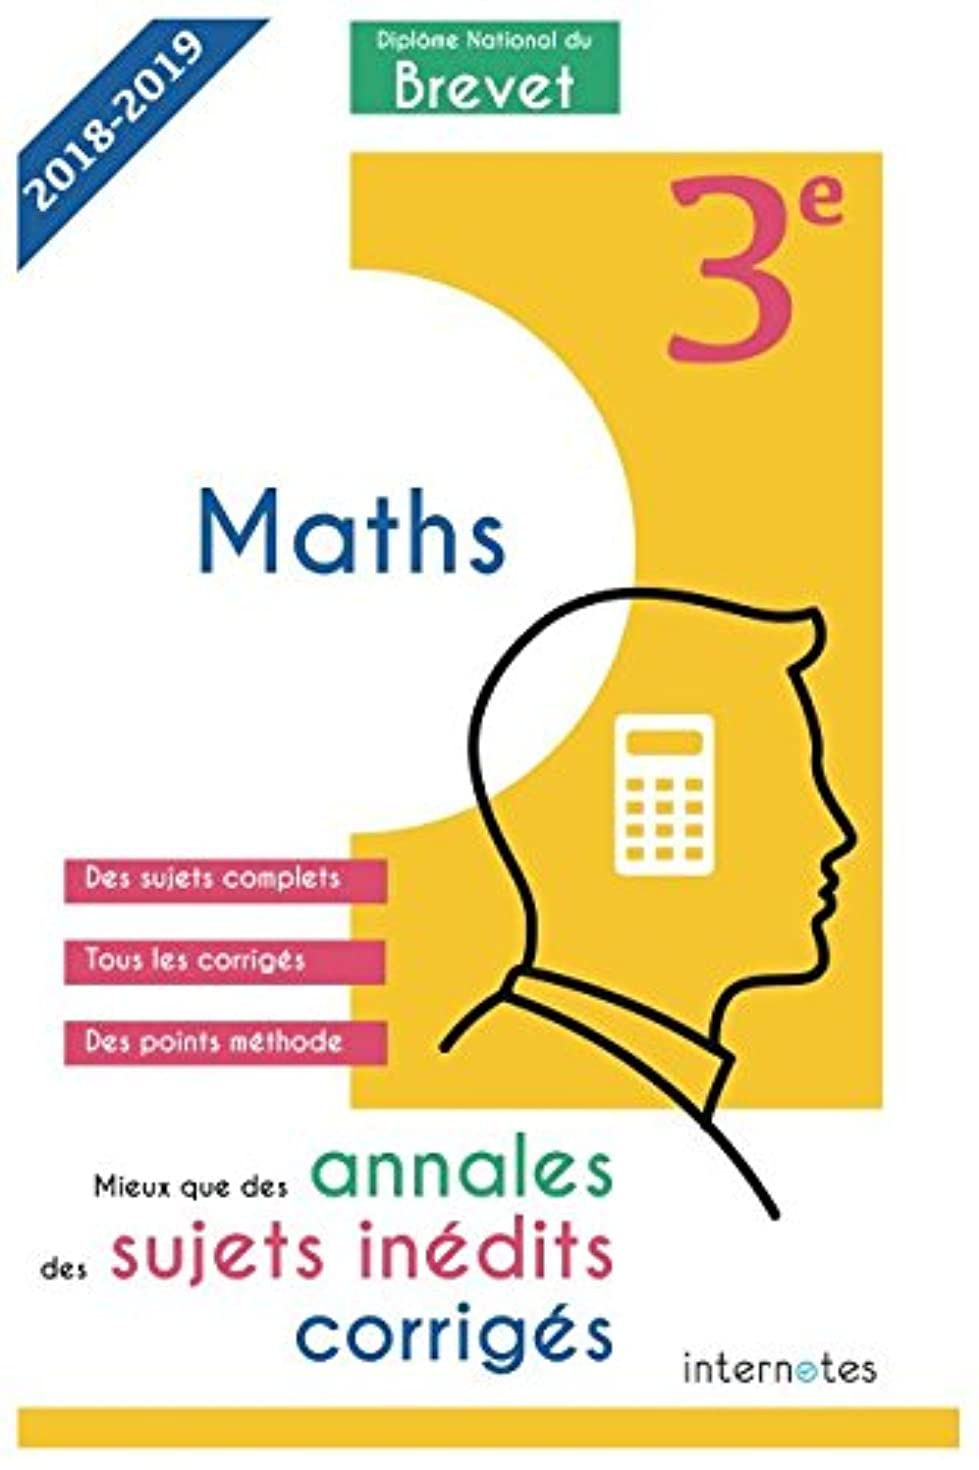 欲望検索オレンジMieux que des annales : des sujets inédits corrigés-  Dipl?me National du Brevet Maths - 3e: Troisième - épreuve de Mathématiques - DNB